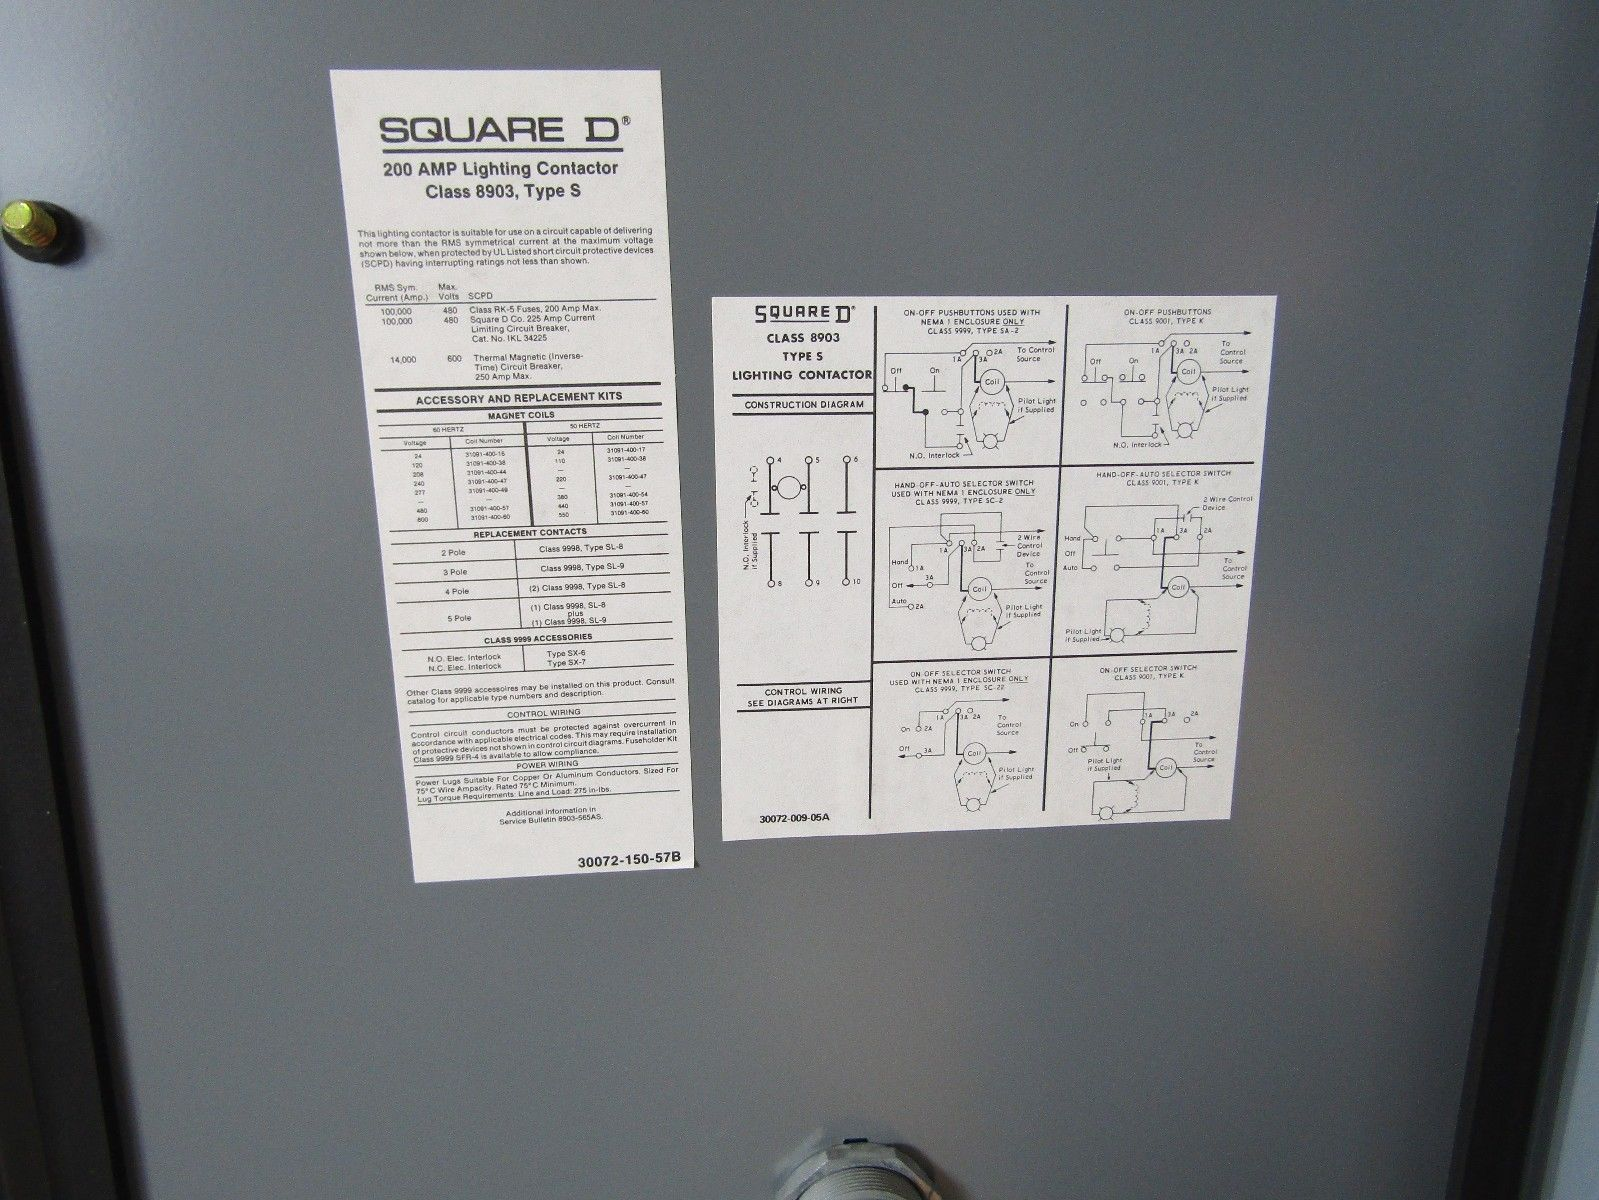 3 pole contactor 120v coil wiring diagram wind turbine generator new square d 8903svh2v02 200 amp 600v phase